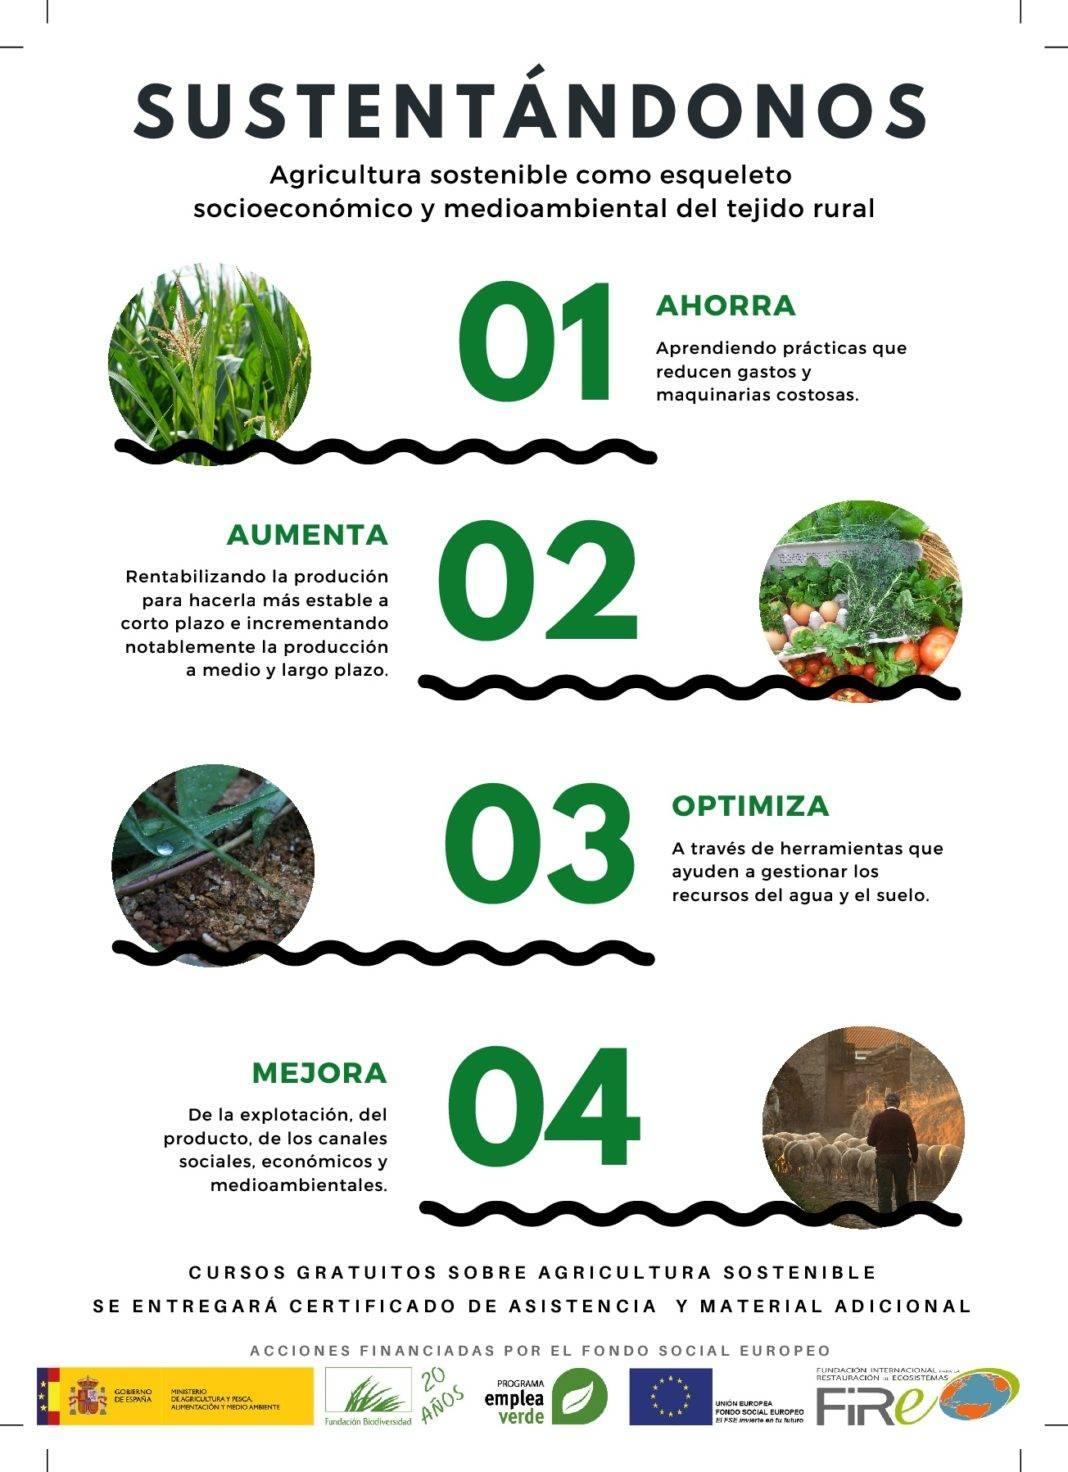 agricultura sostenible herencia 2 1068x1472 - Cursos gratuitos sobre agricultura sostenible en Herencia